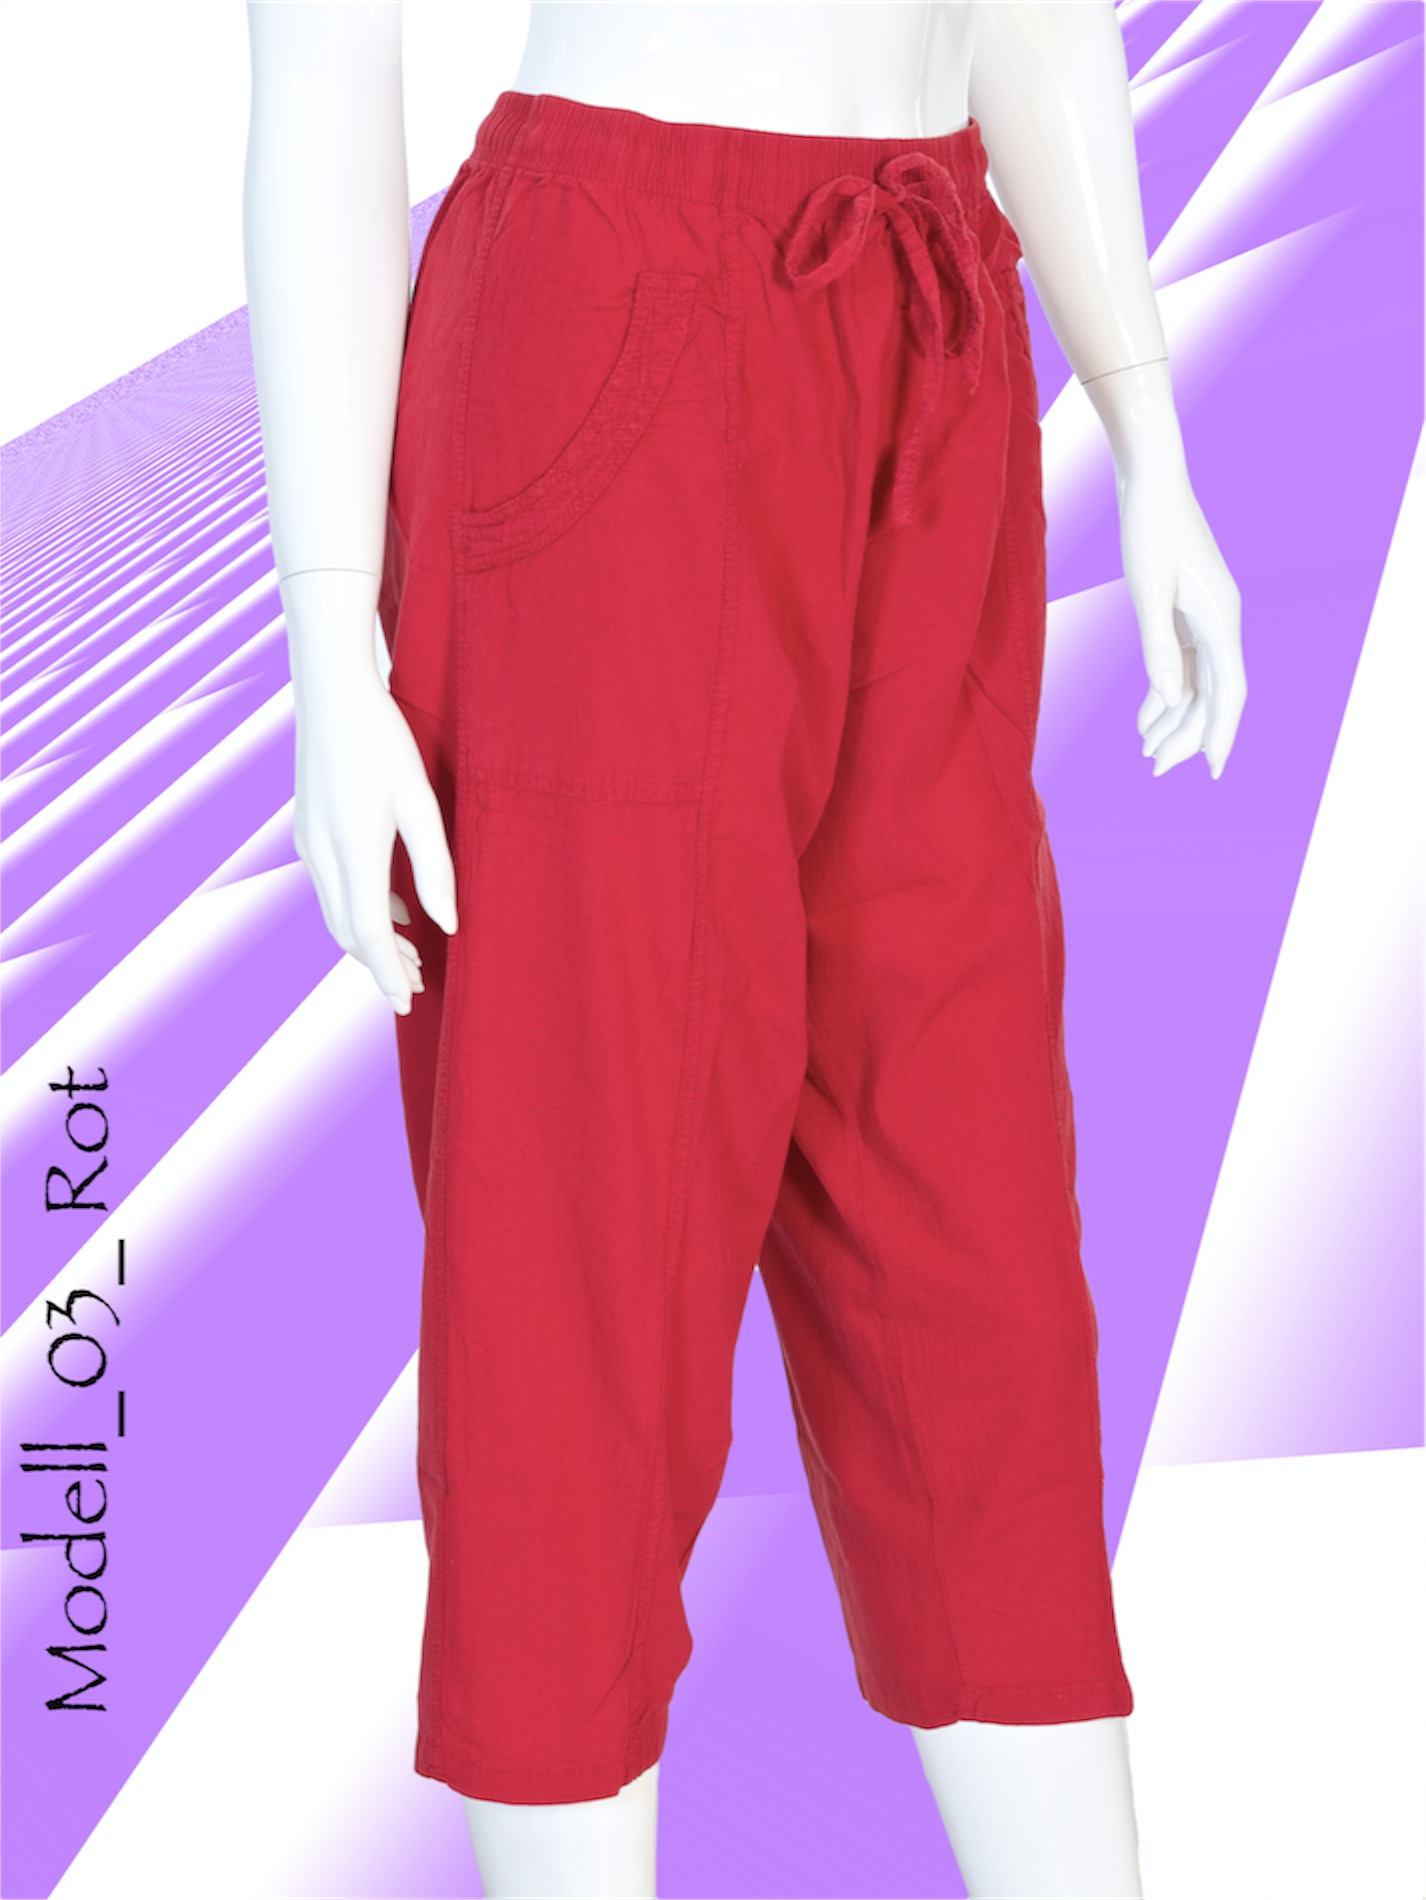 damen shorts 3 4 urban vintage short bermuda cargo capri kurze hose l xxxxl neu ebay. Black Bedroom Furniture Sets. Home Design Ideas